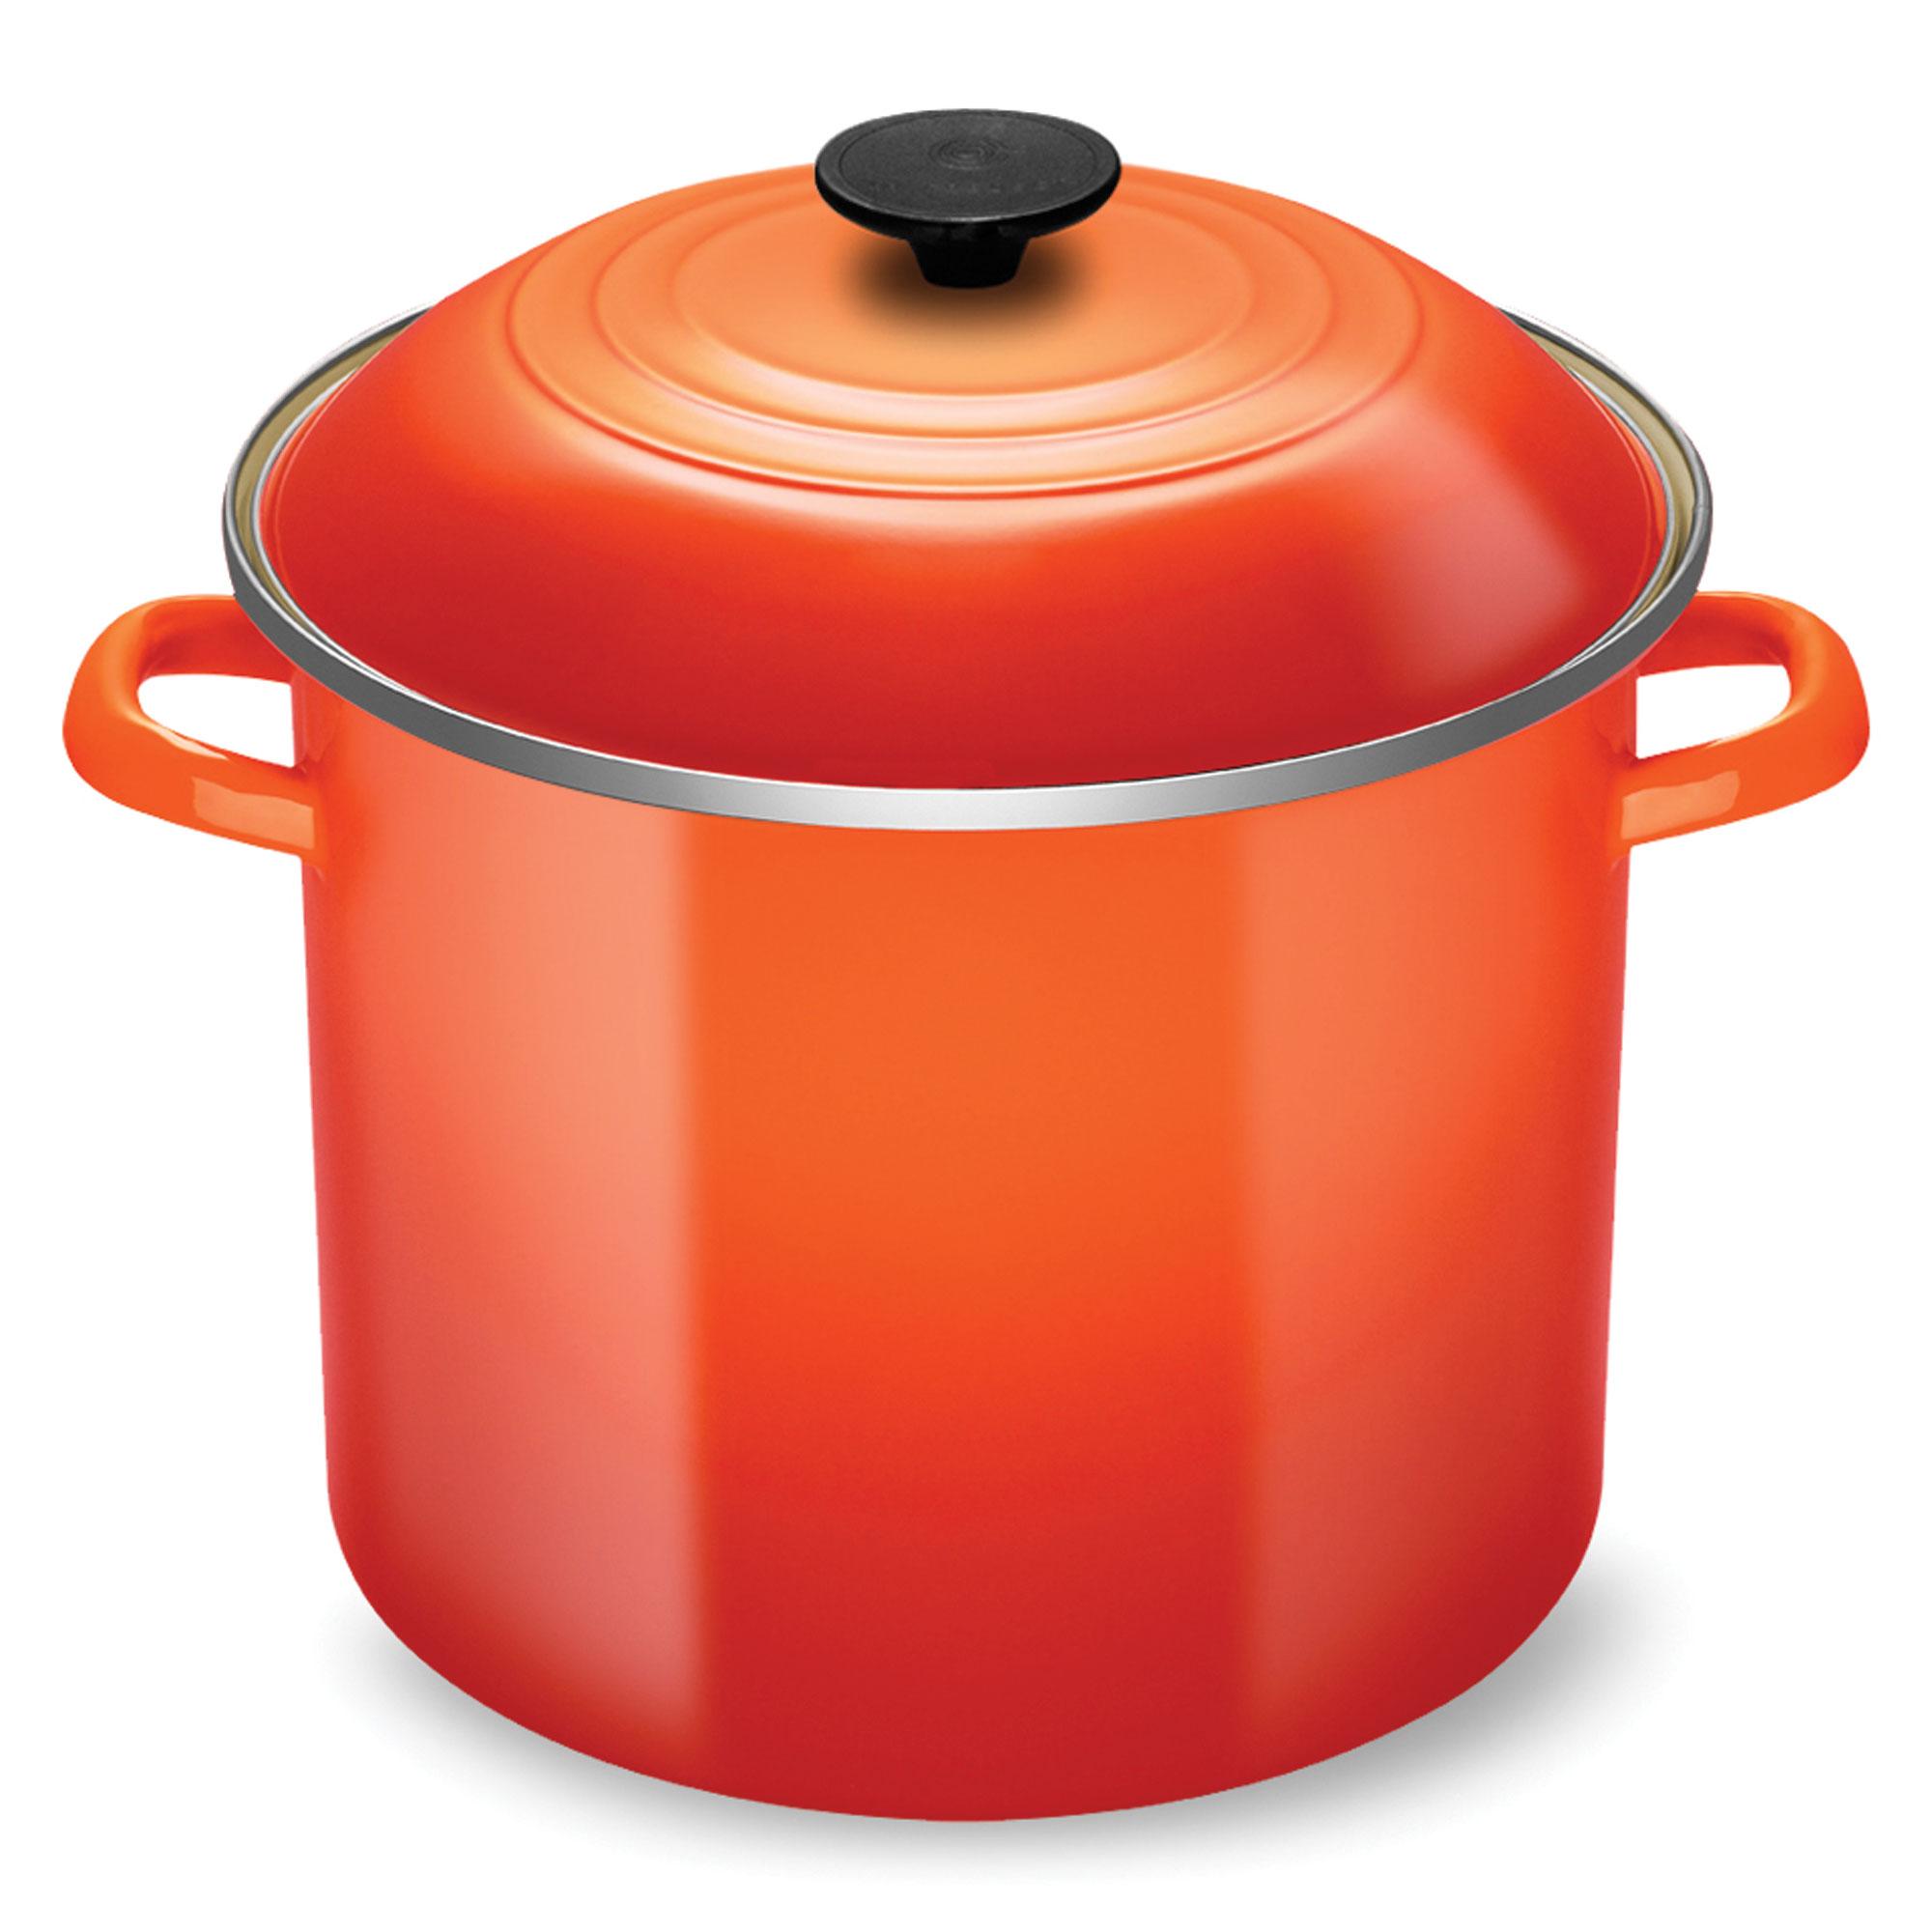 Le Creuset Enameled Steel Stock Pot 12 Quart Flame